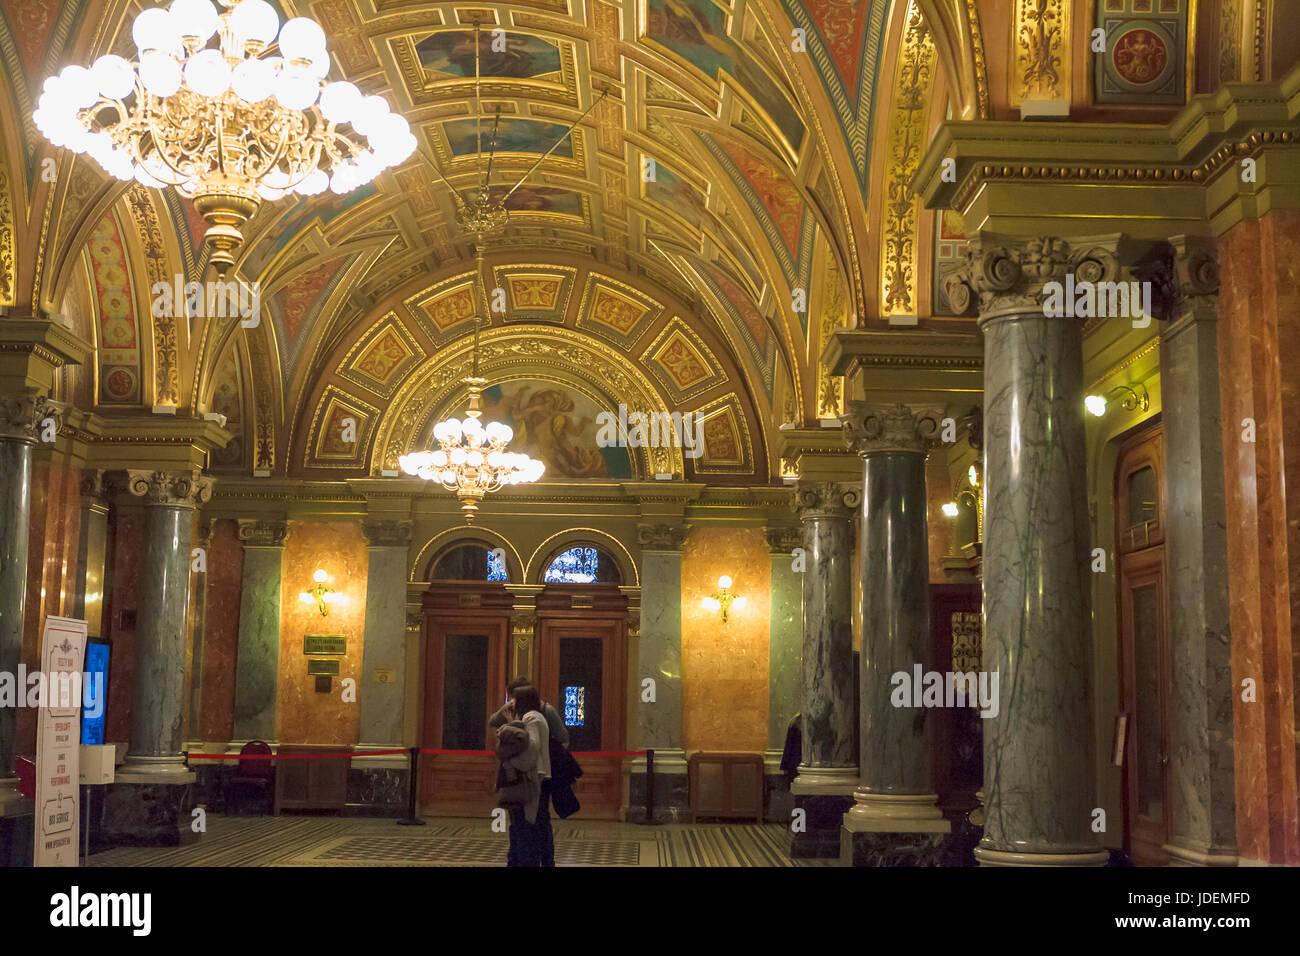 Foyer of the Hungarian State Opera House, Andrássy útca, Terézváros, Budapest, Hungary - Stock Image